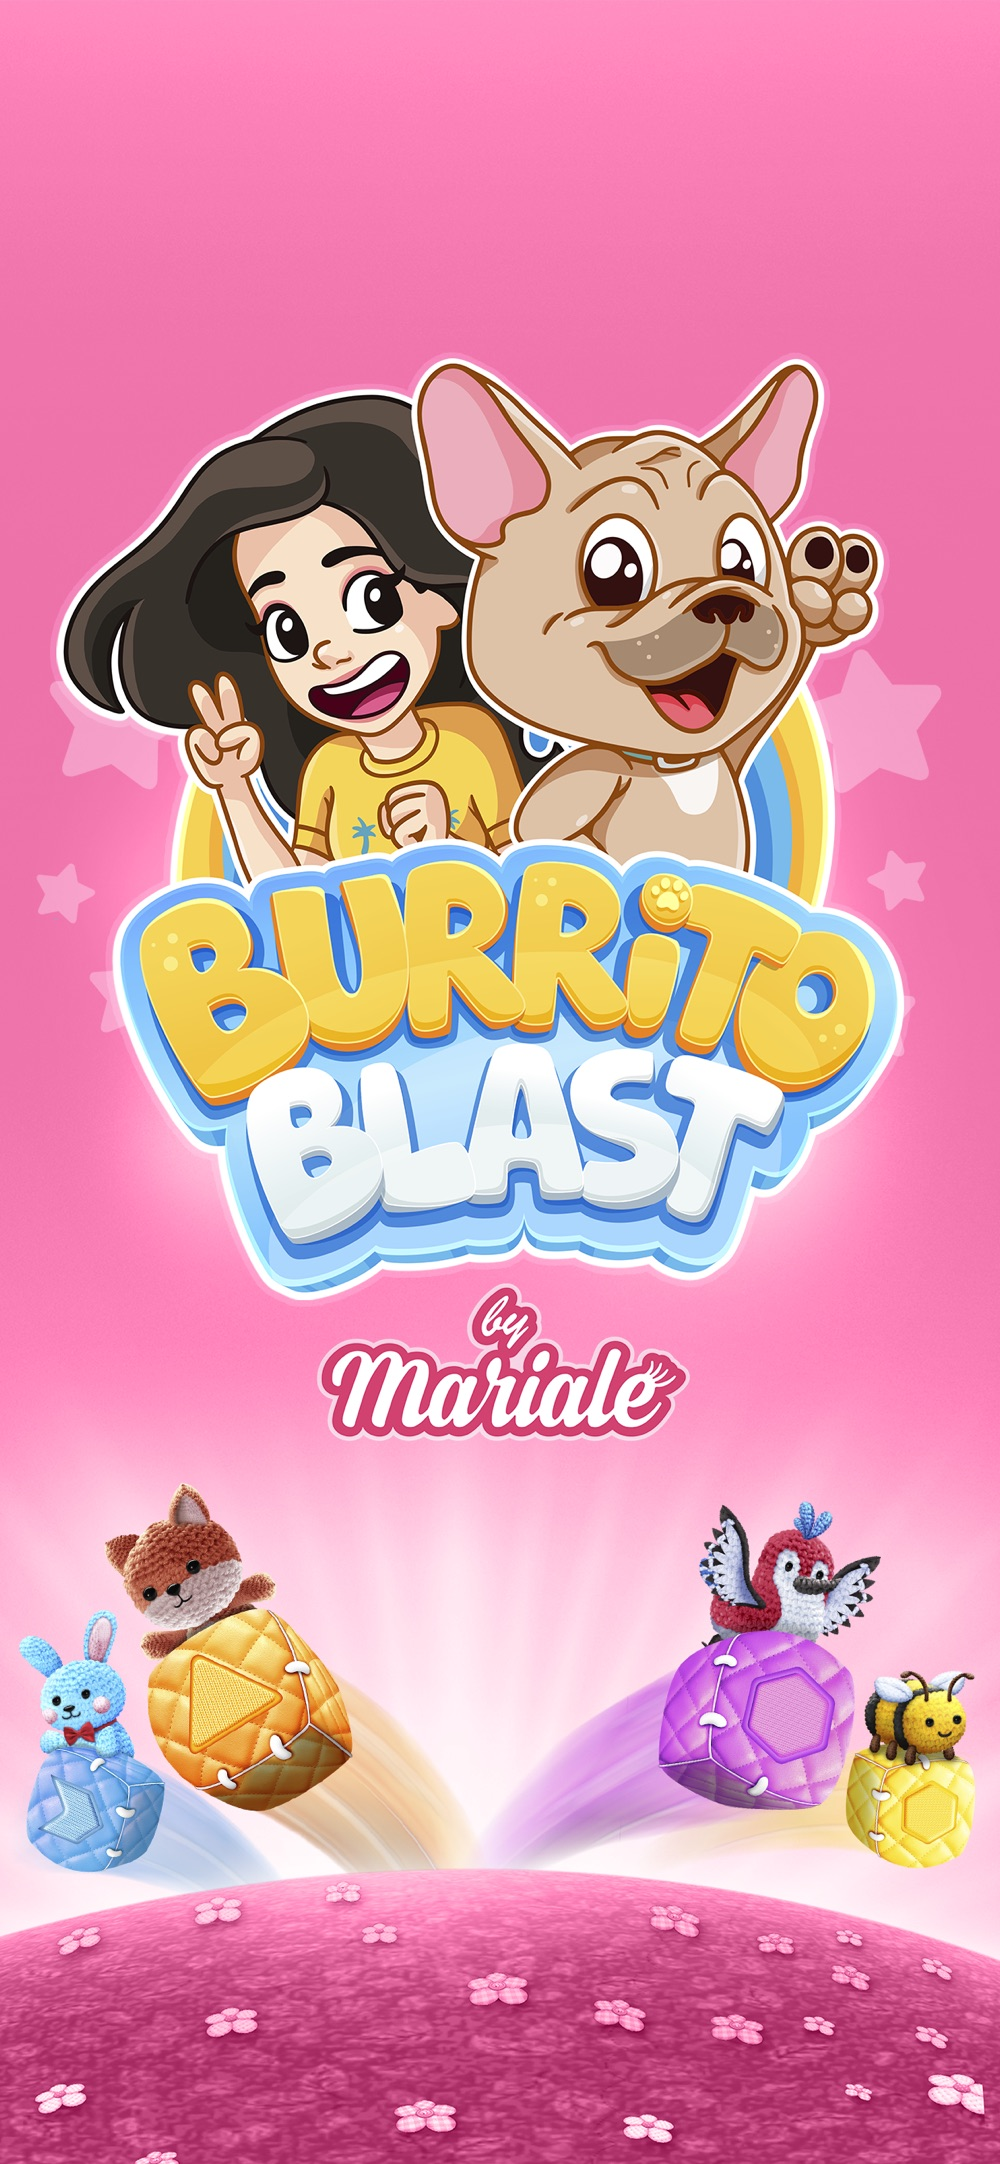 Burrito Blast by Mariale Cheat Codes